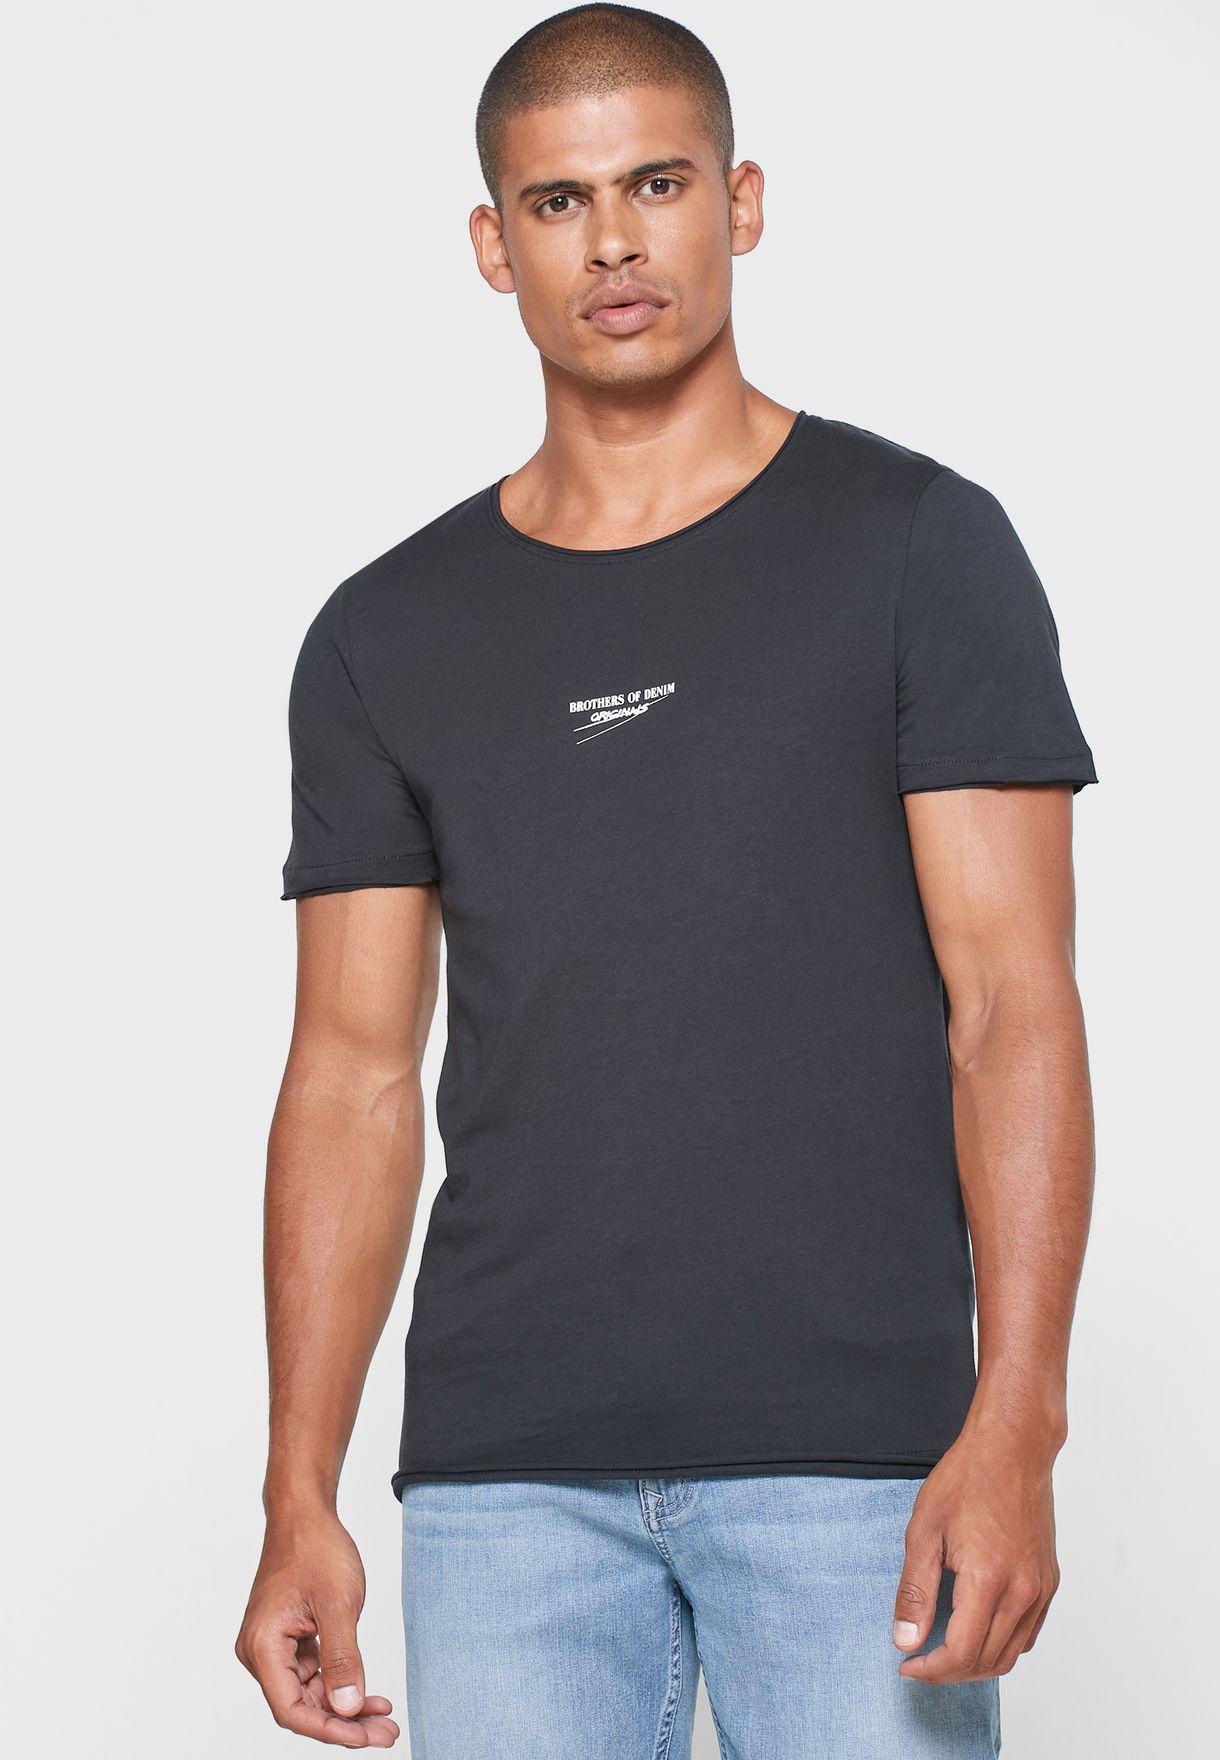 Curved Hem Slim Fit Crew Neck T-Shirt